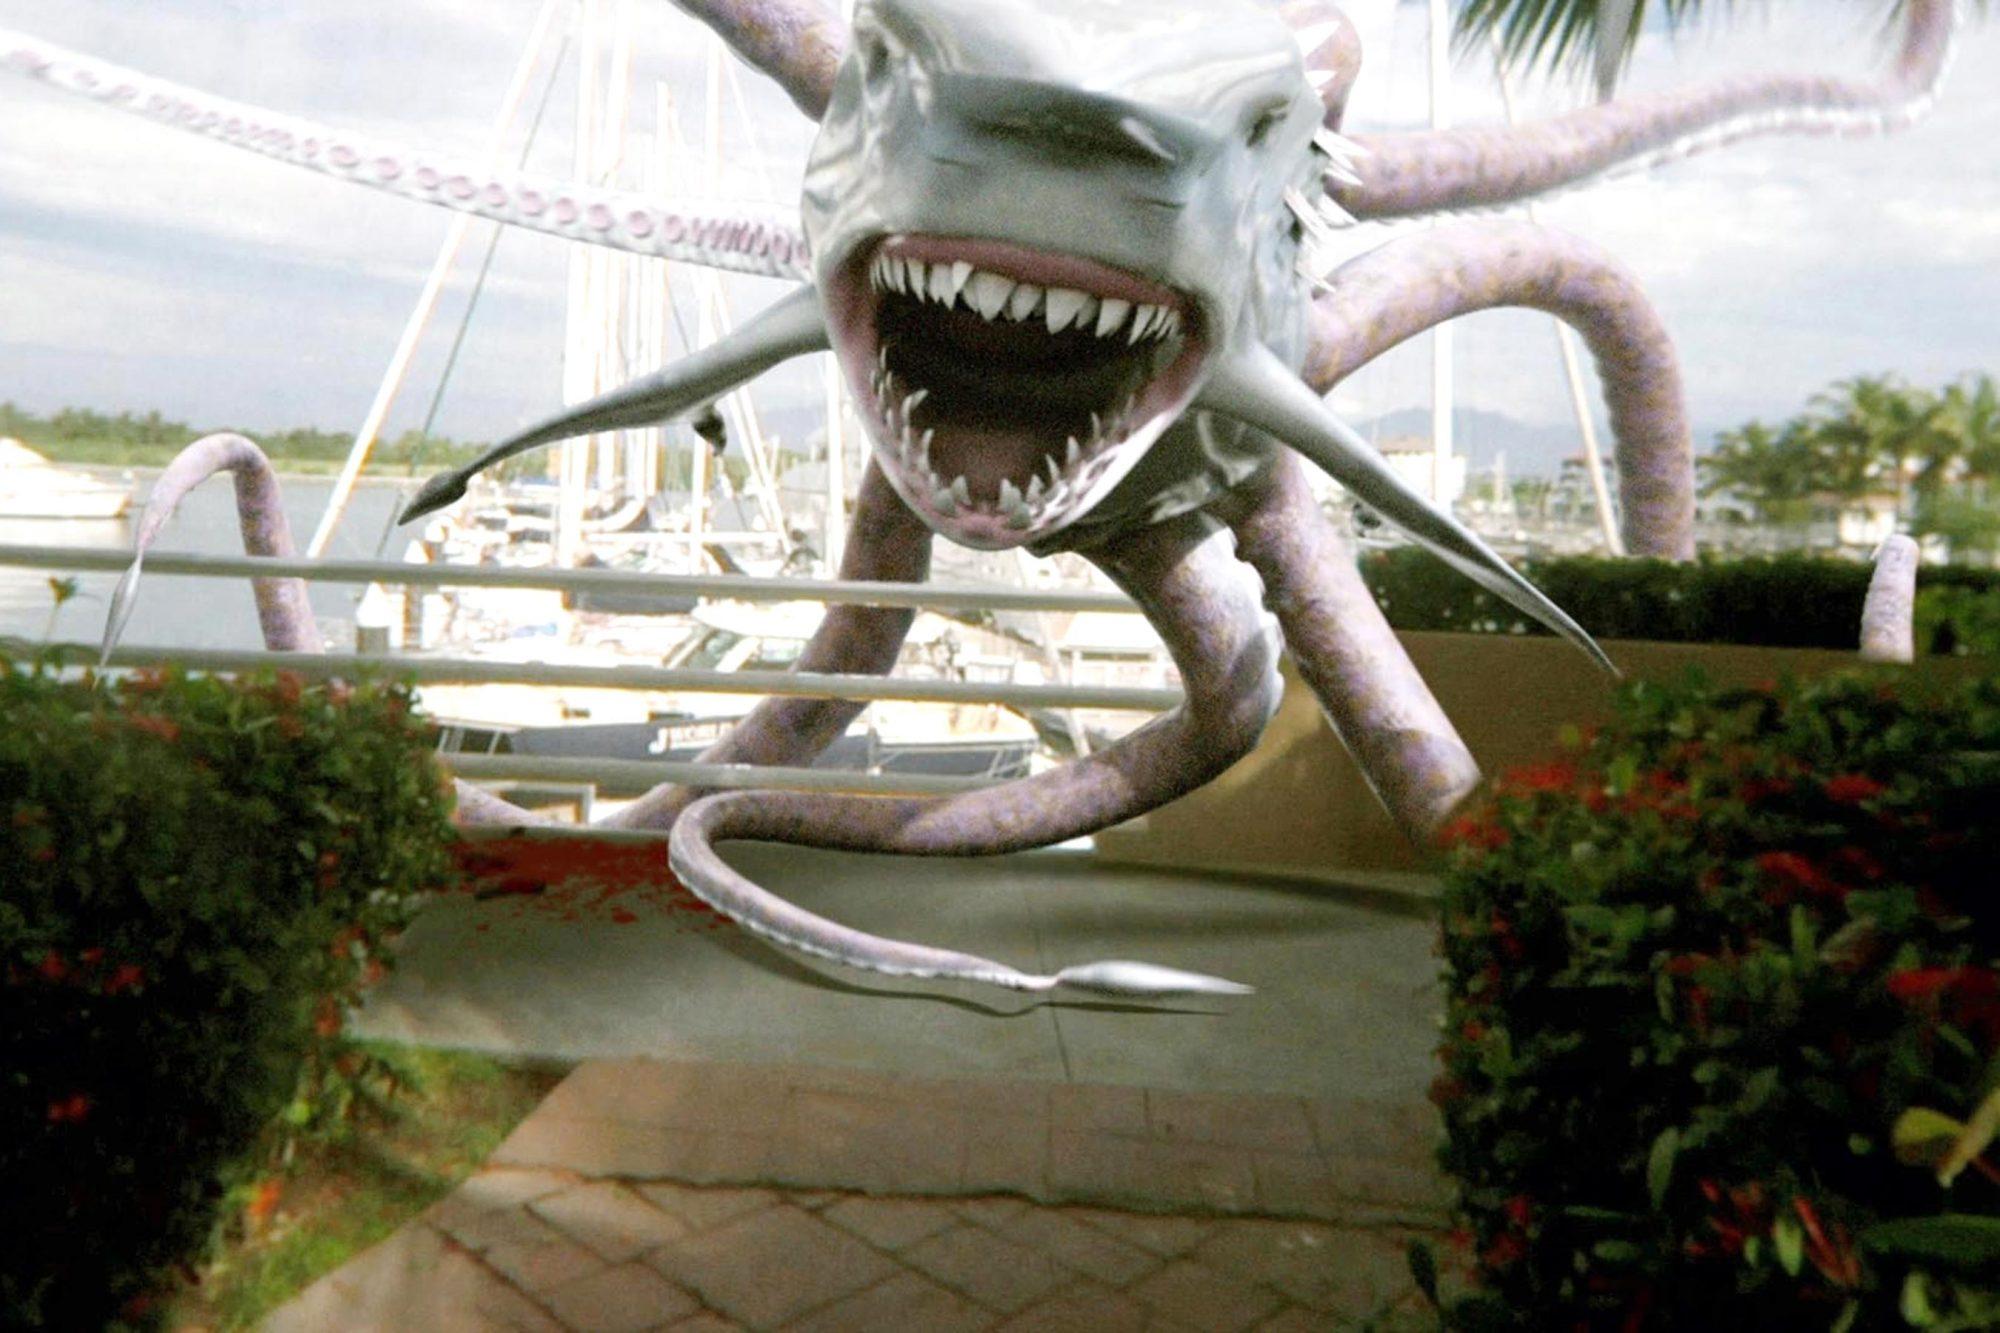 Sharktopus - 2010